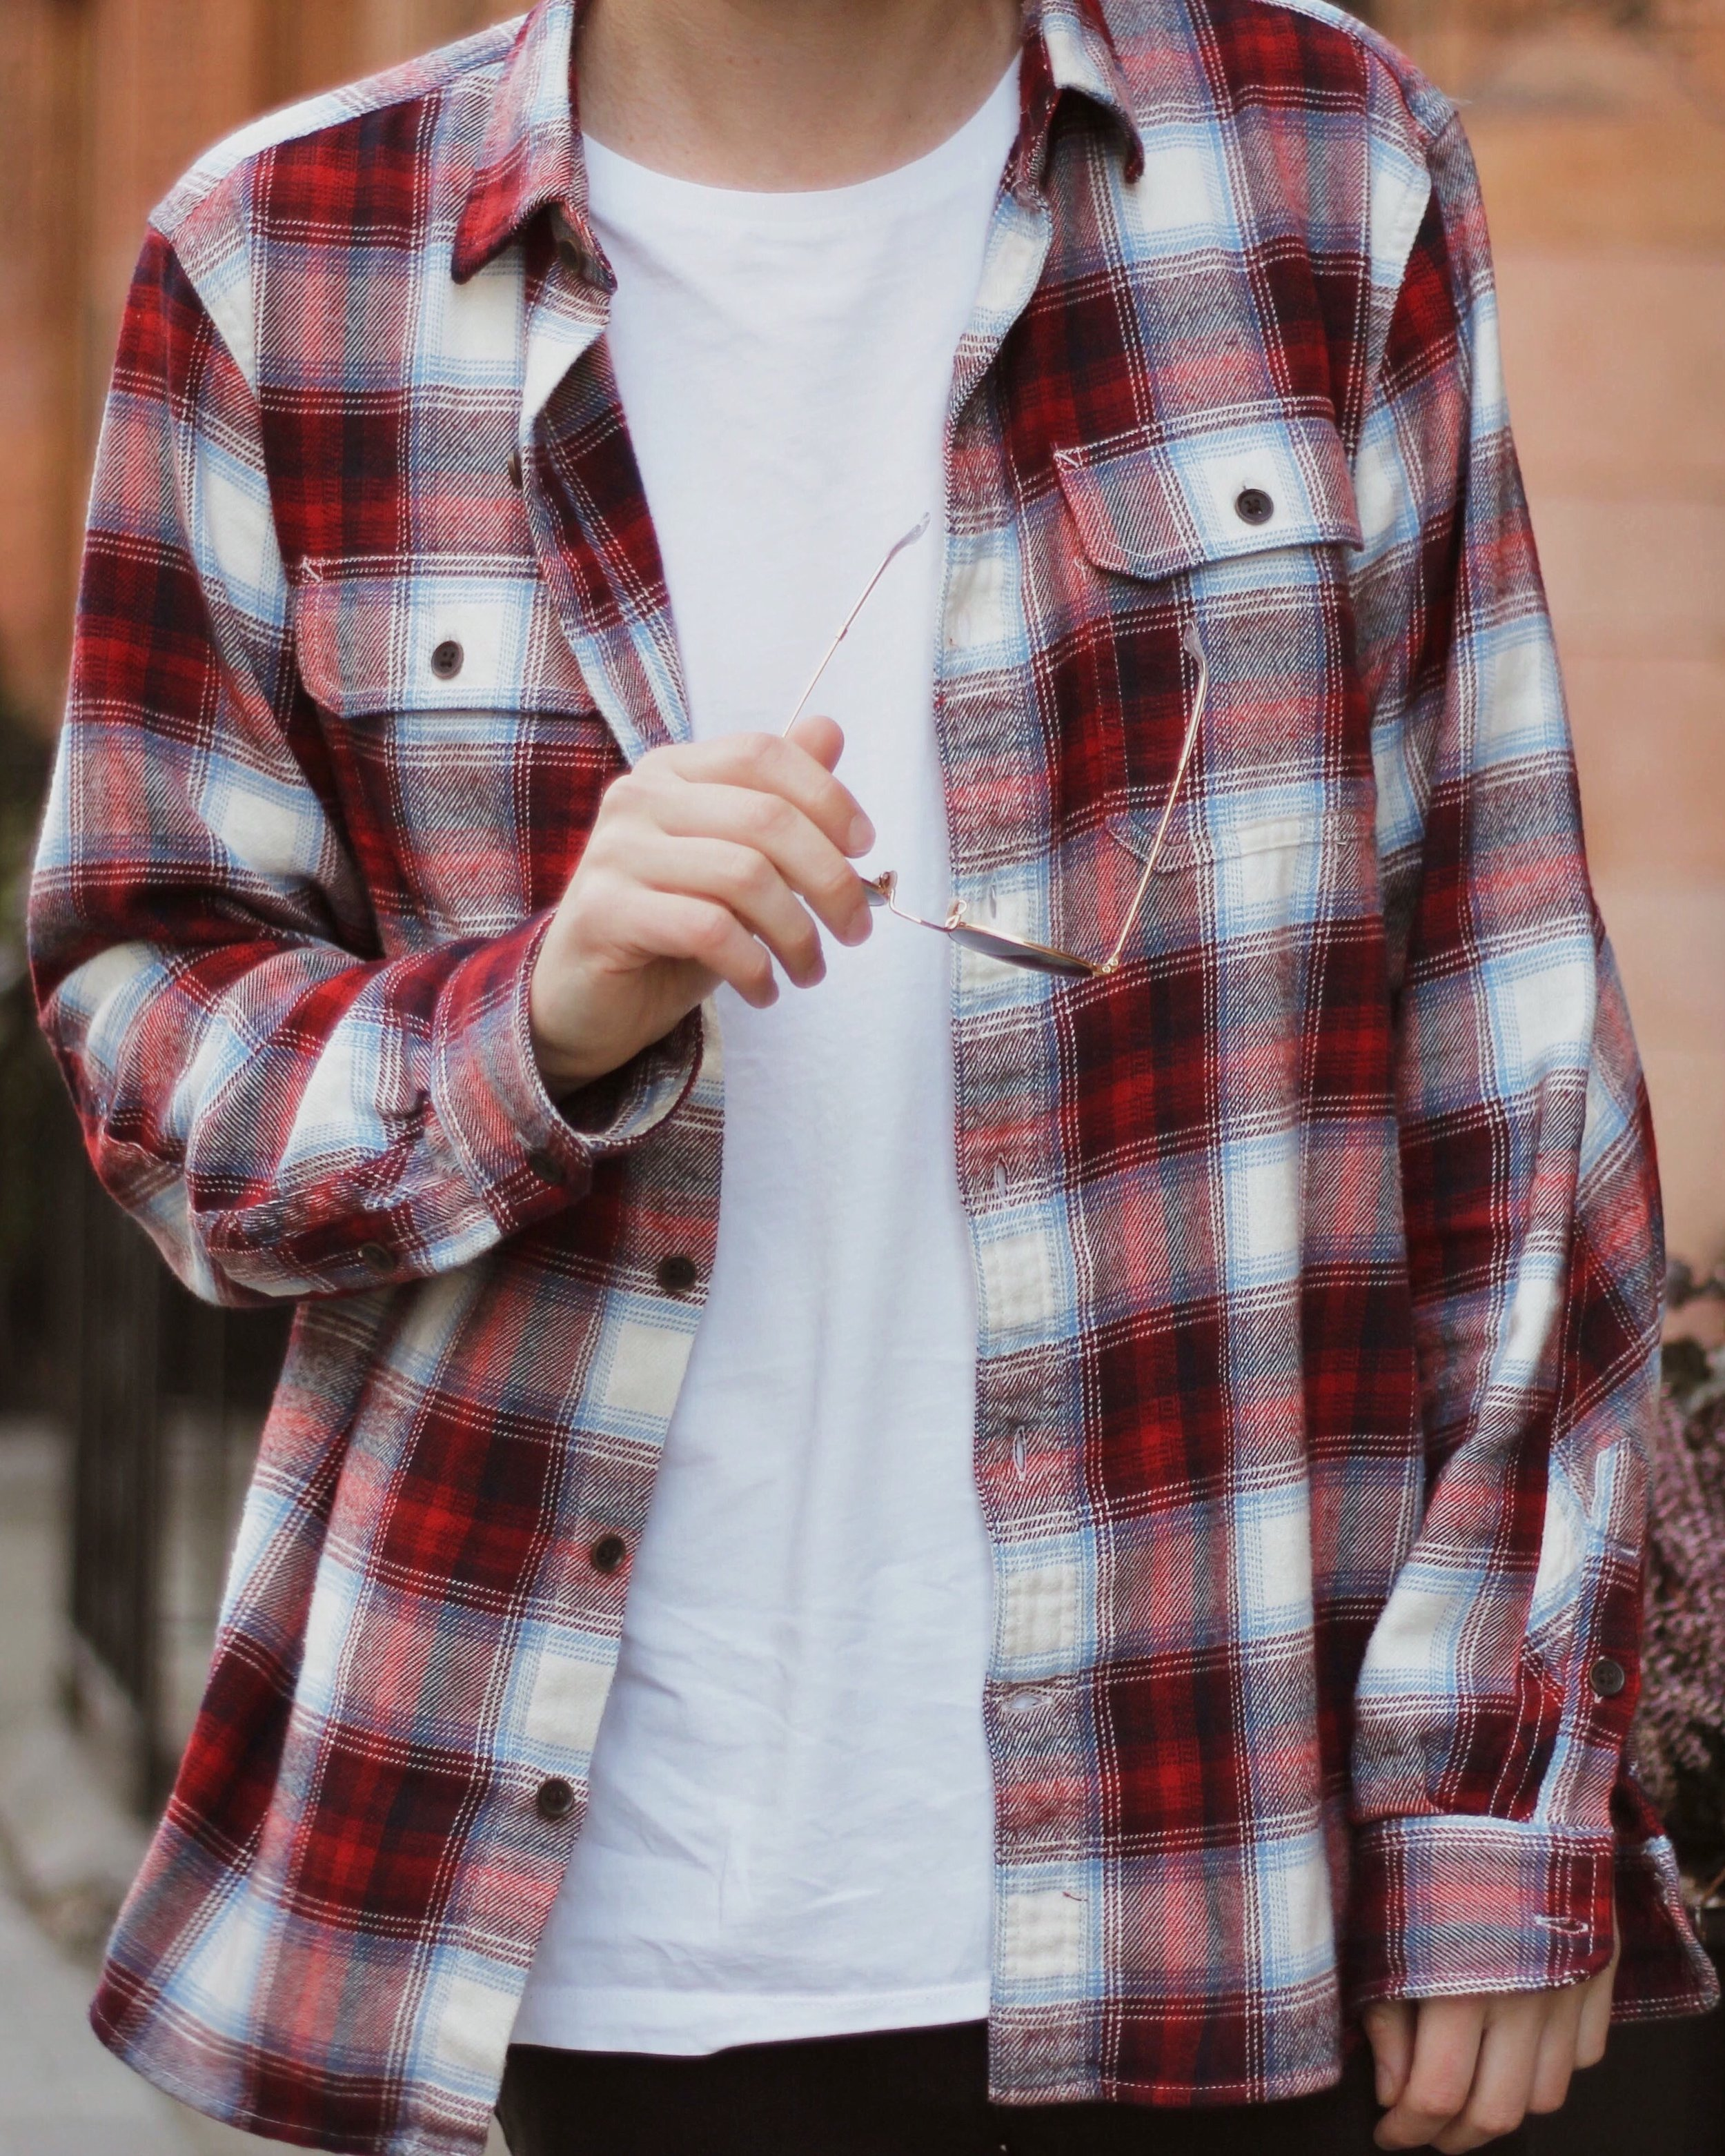 chekcered_shirt_ootd